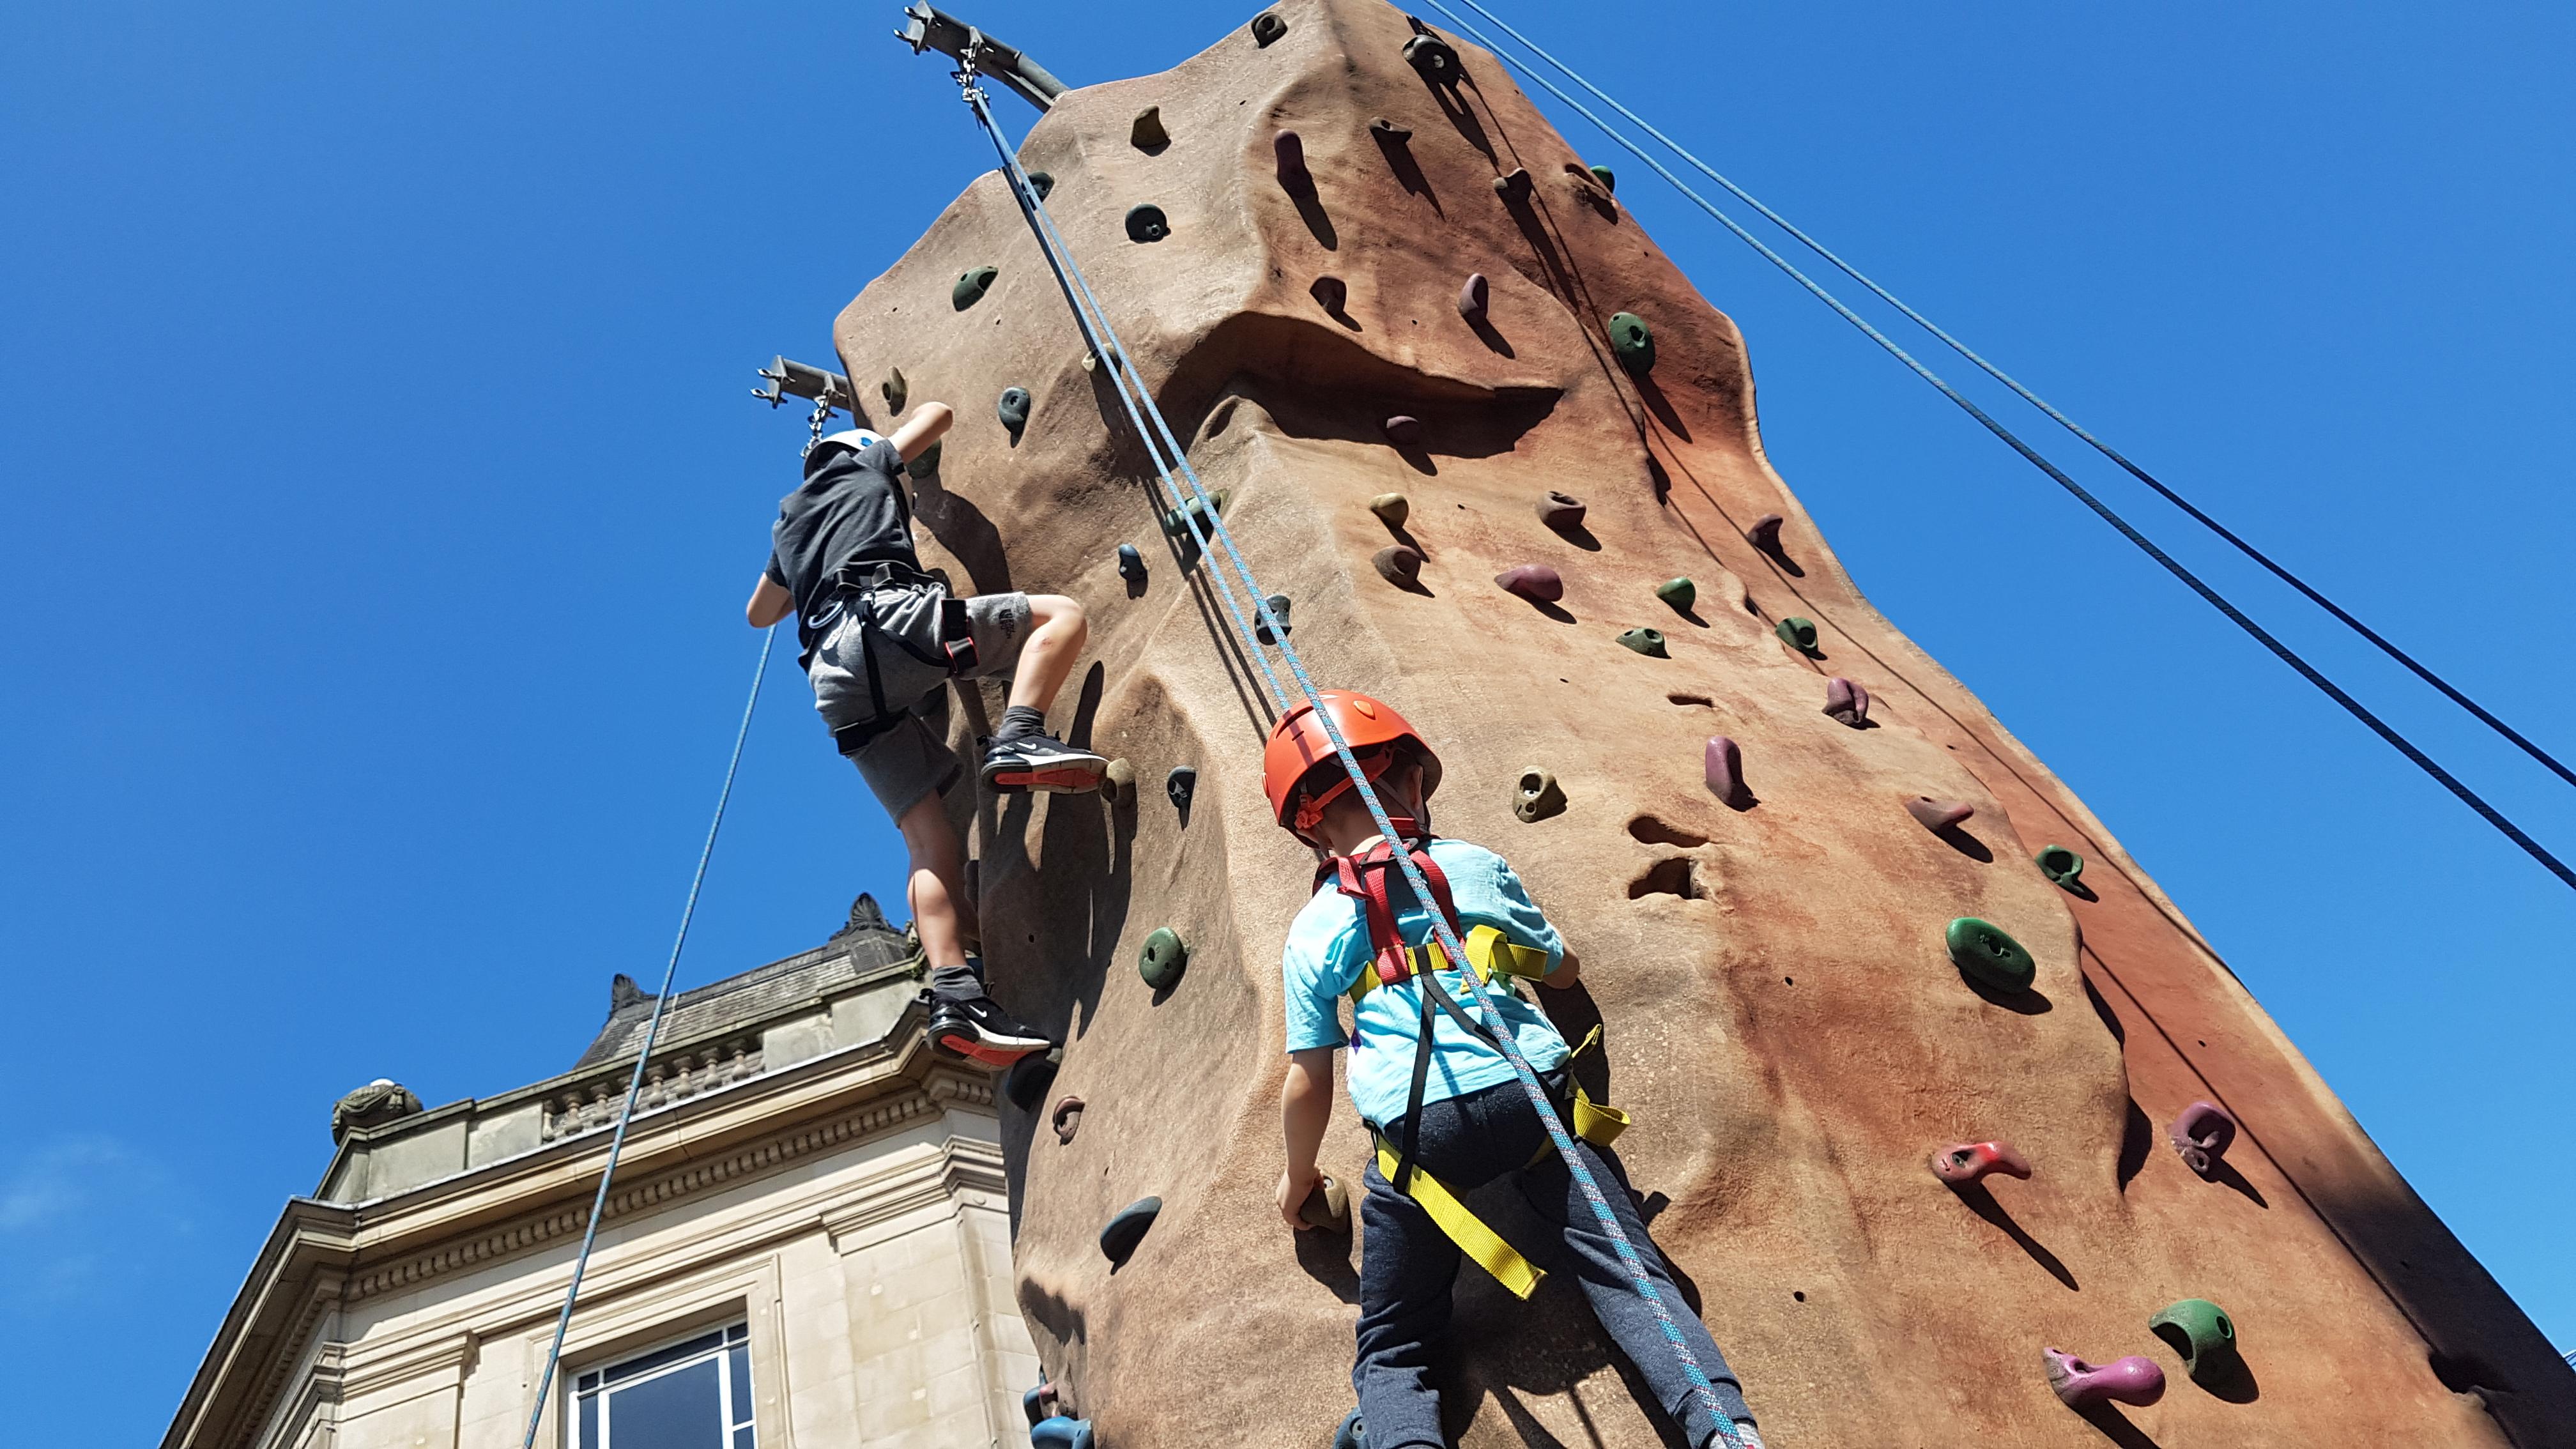 climbing, learn to climb, taster climbing